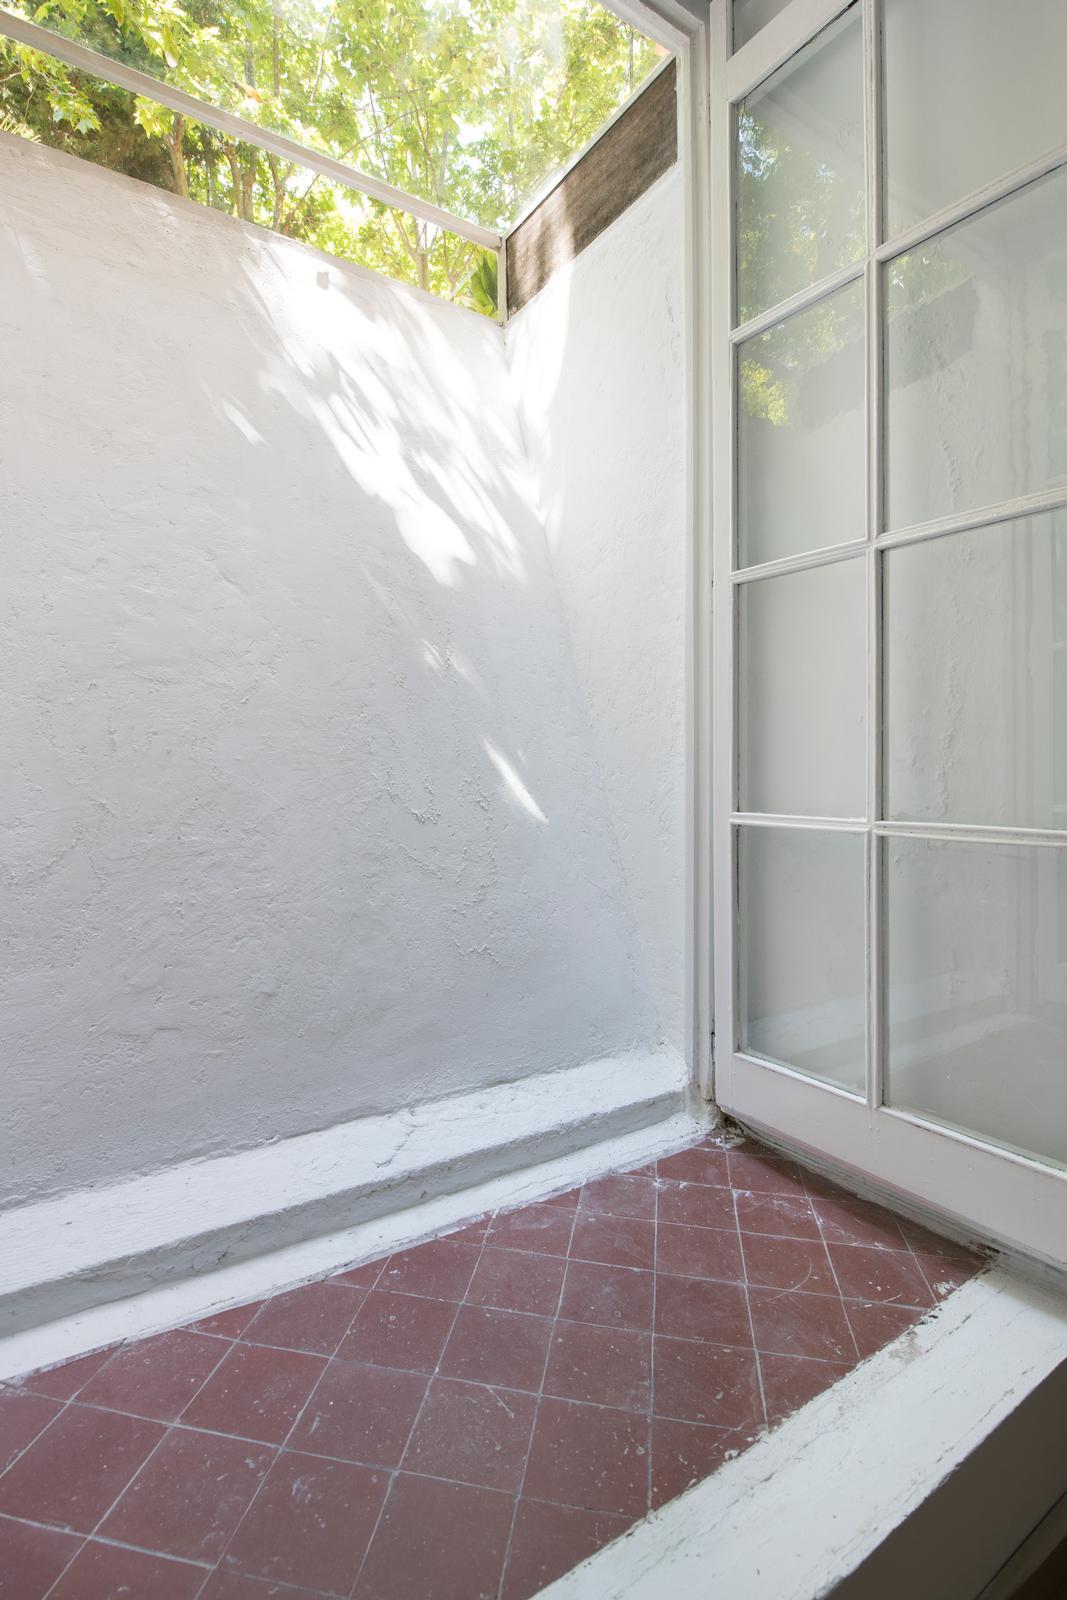 Ref.: 21523 - DÚPLEX EN TORRE CATALOGADA